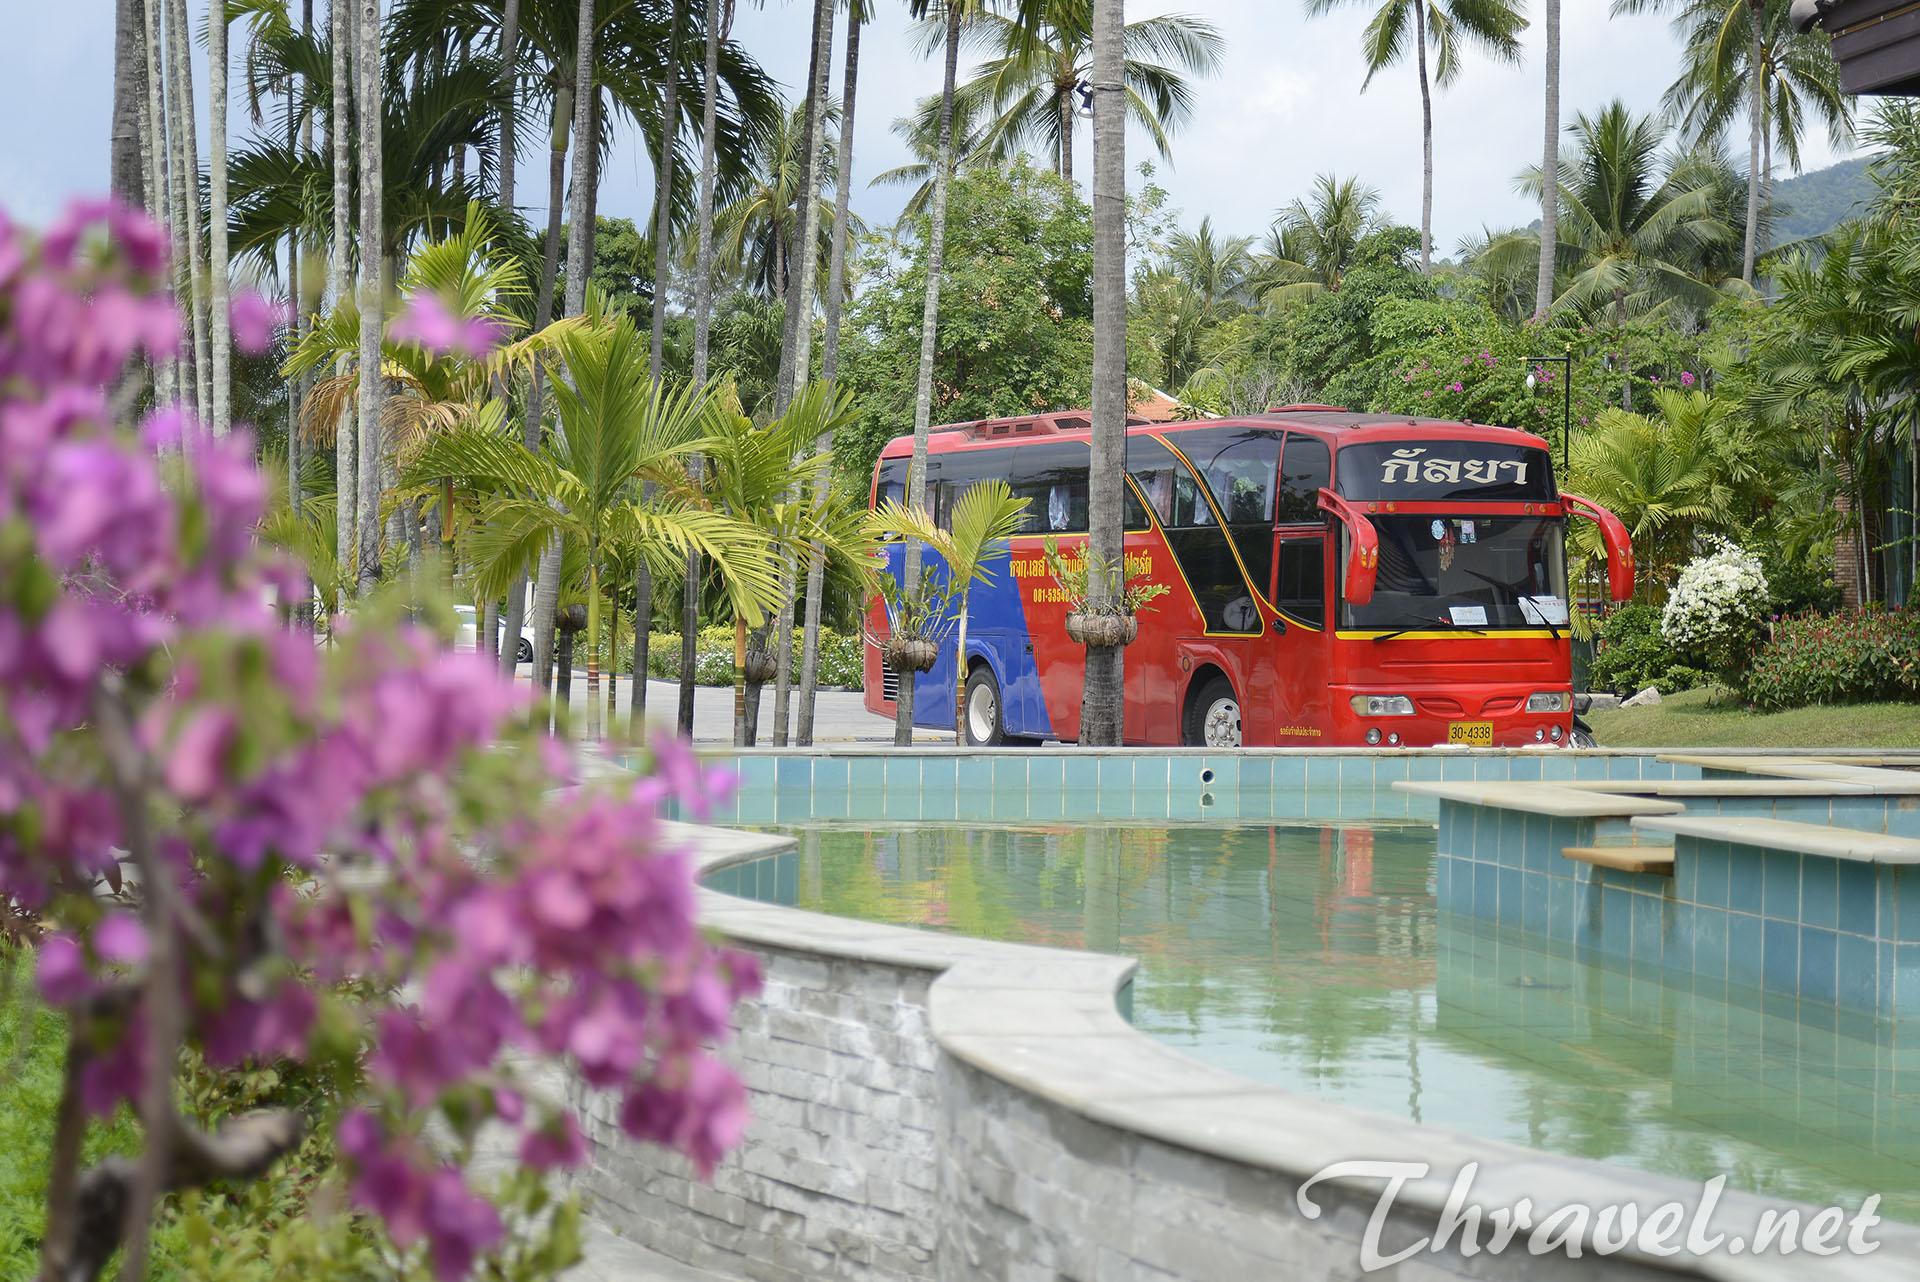 duangjitt-resort-and-spa-hotel-patong-beach-phuket-thailand-04